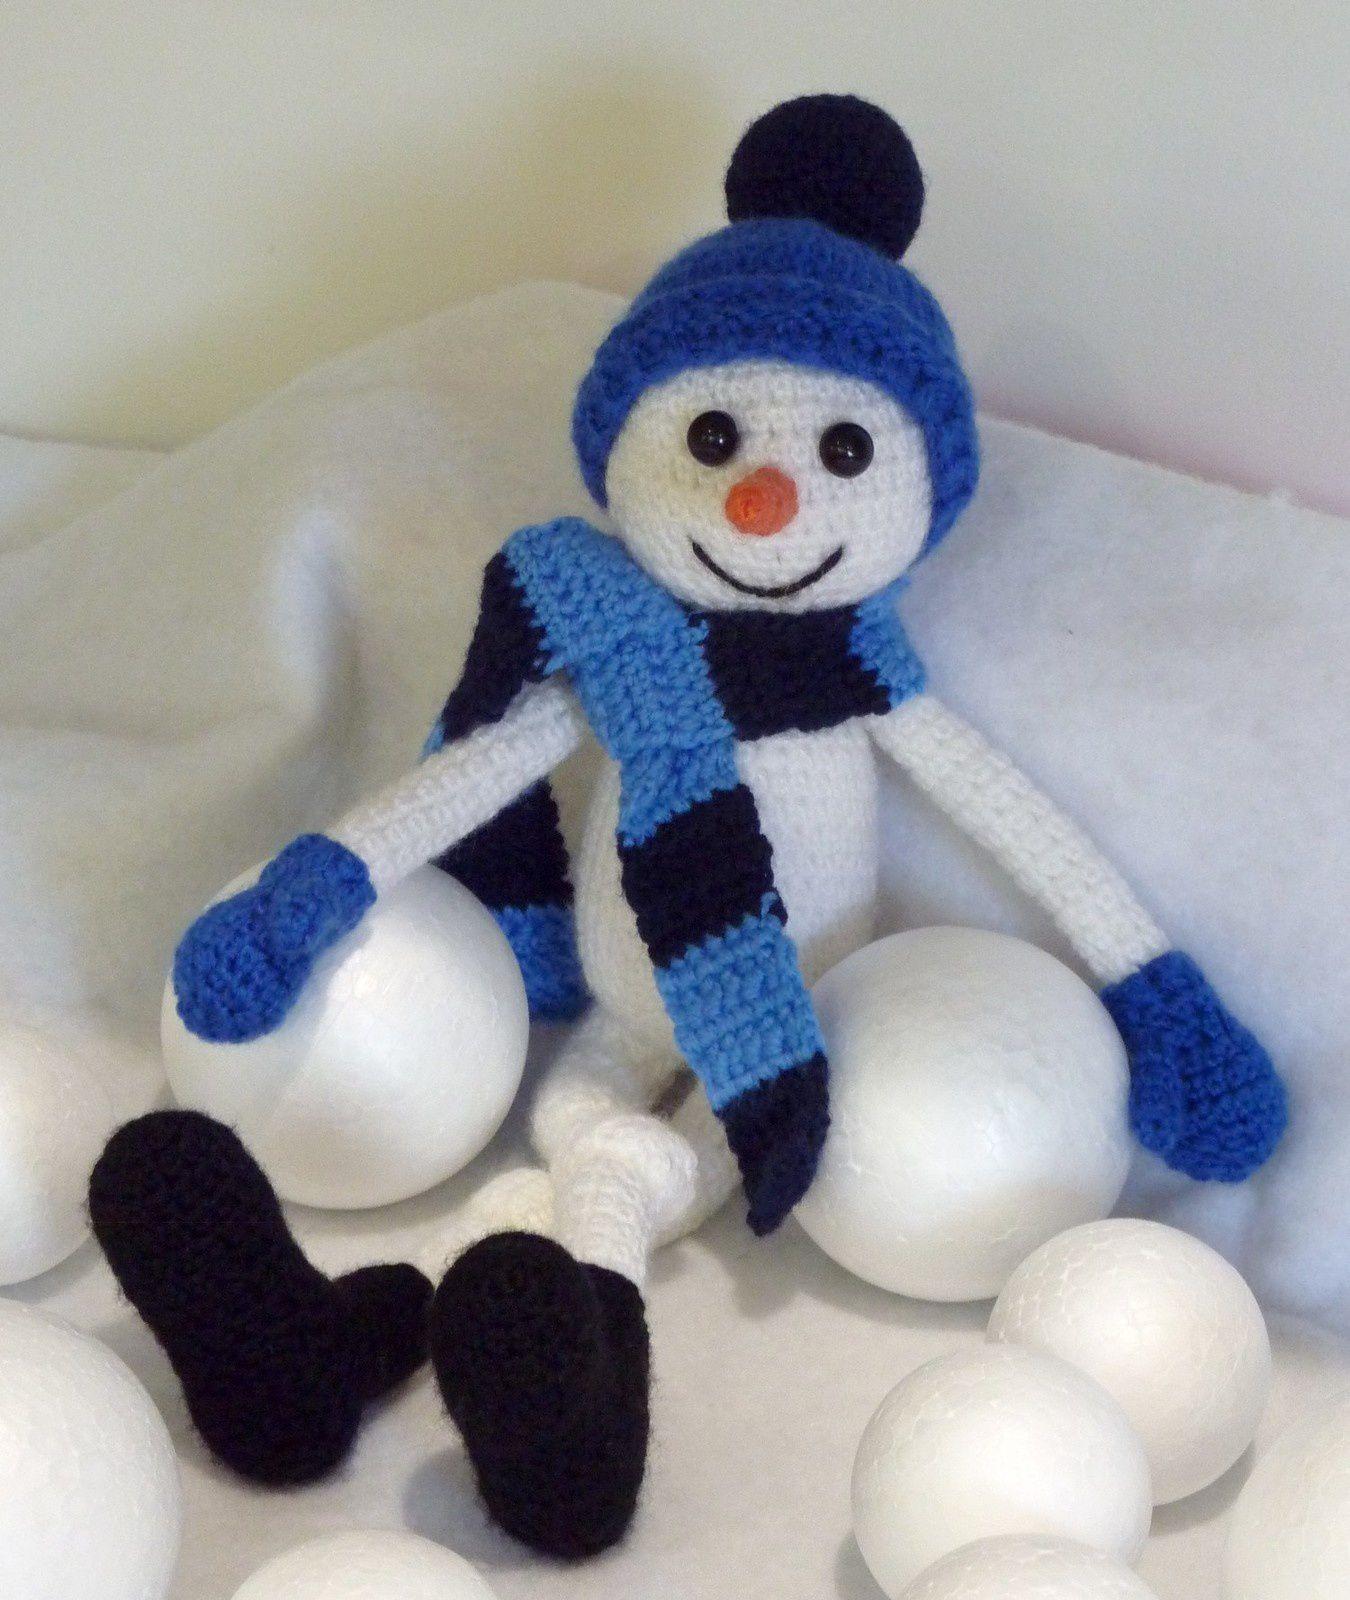 Petit bonhomme de neige